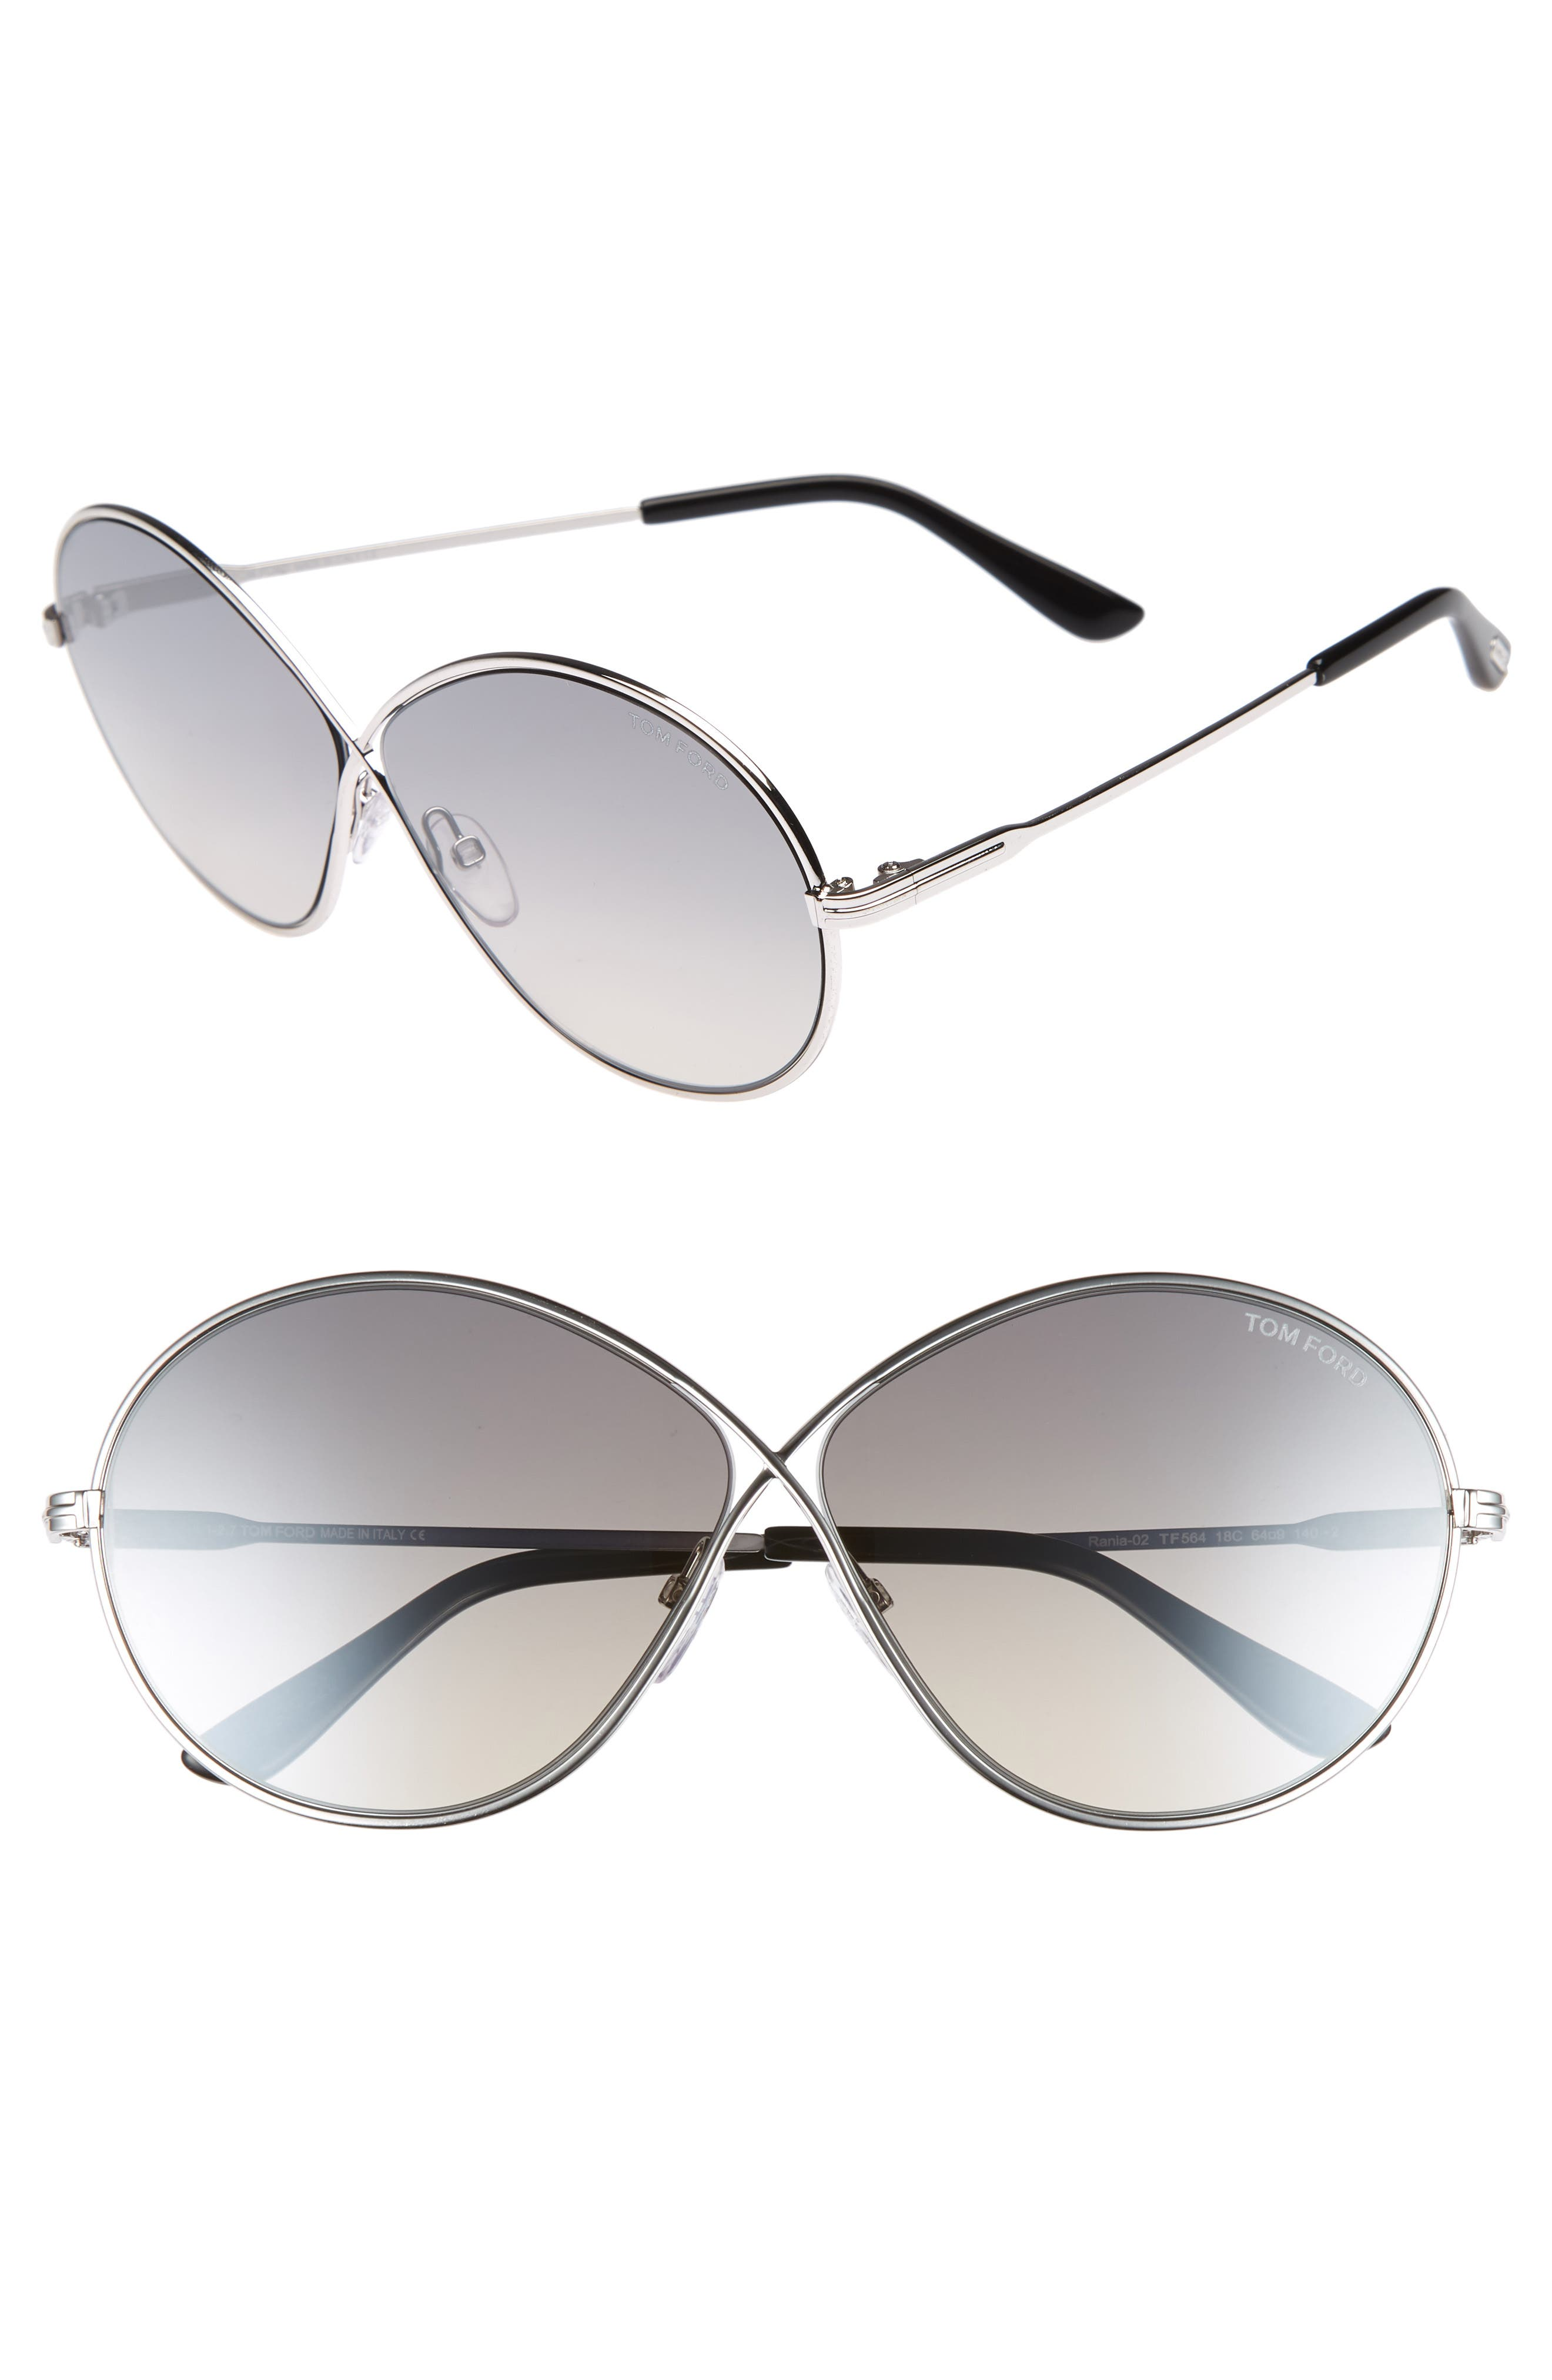 Rania 64mm Oversize Round Sunglasses,                         Main,                         color, 040